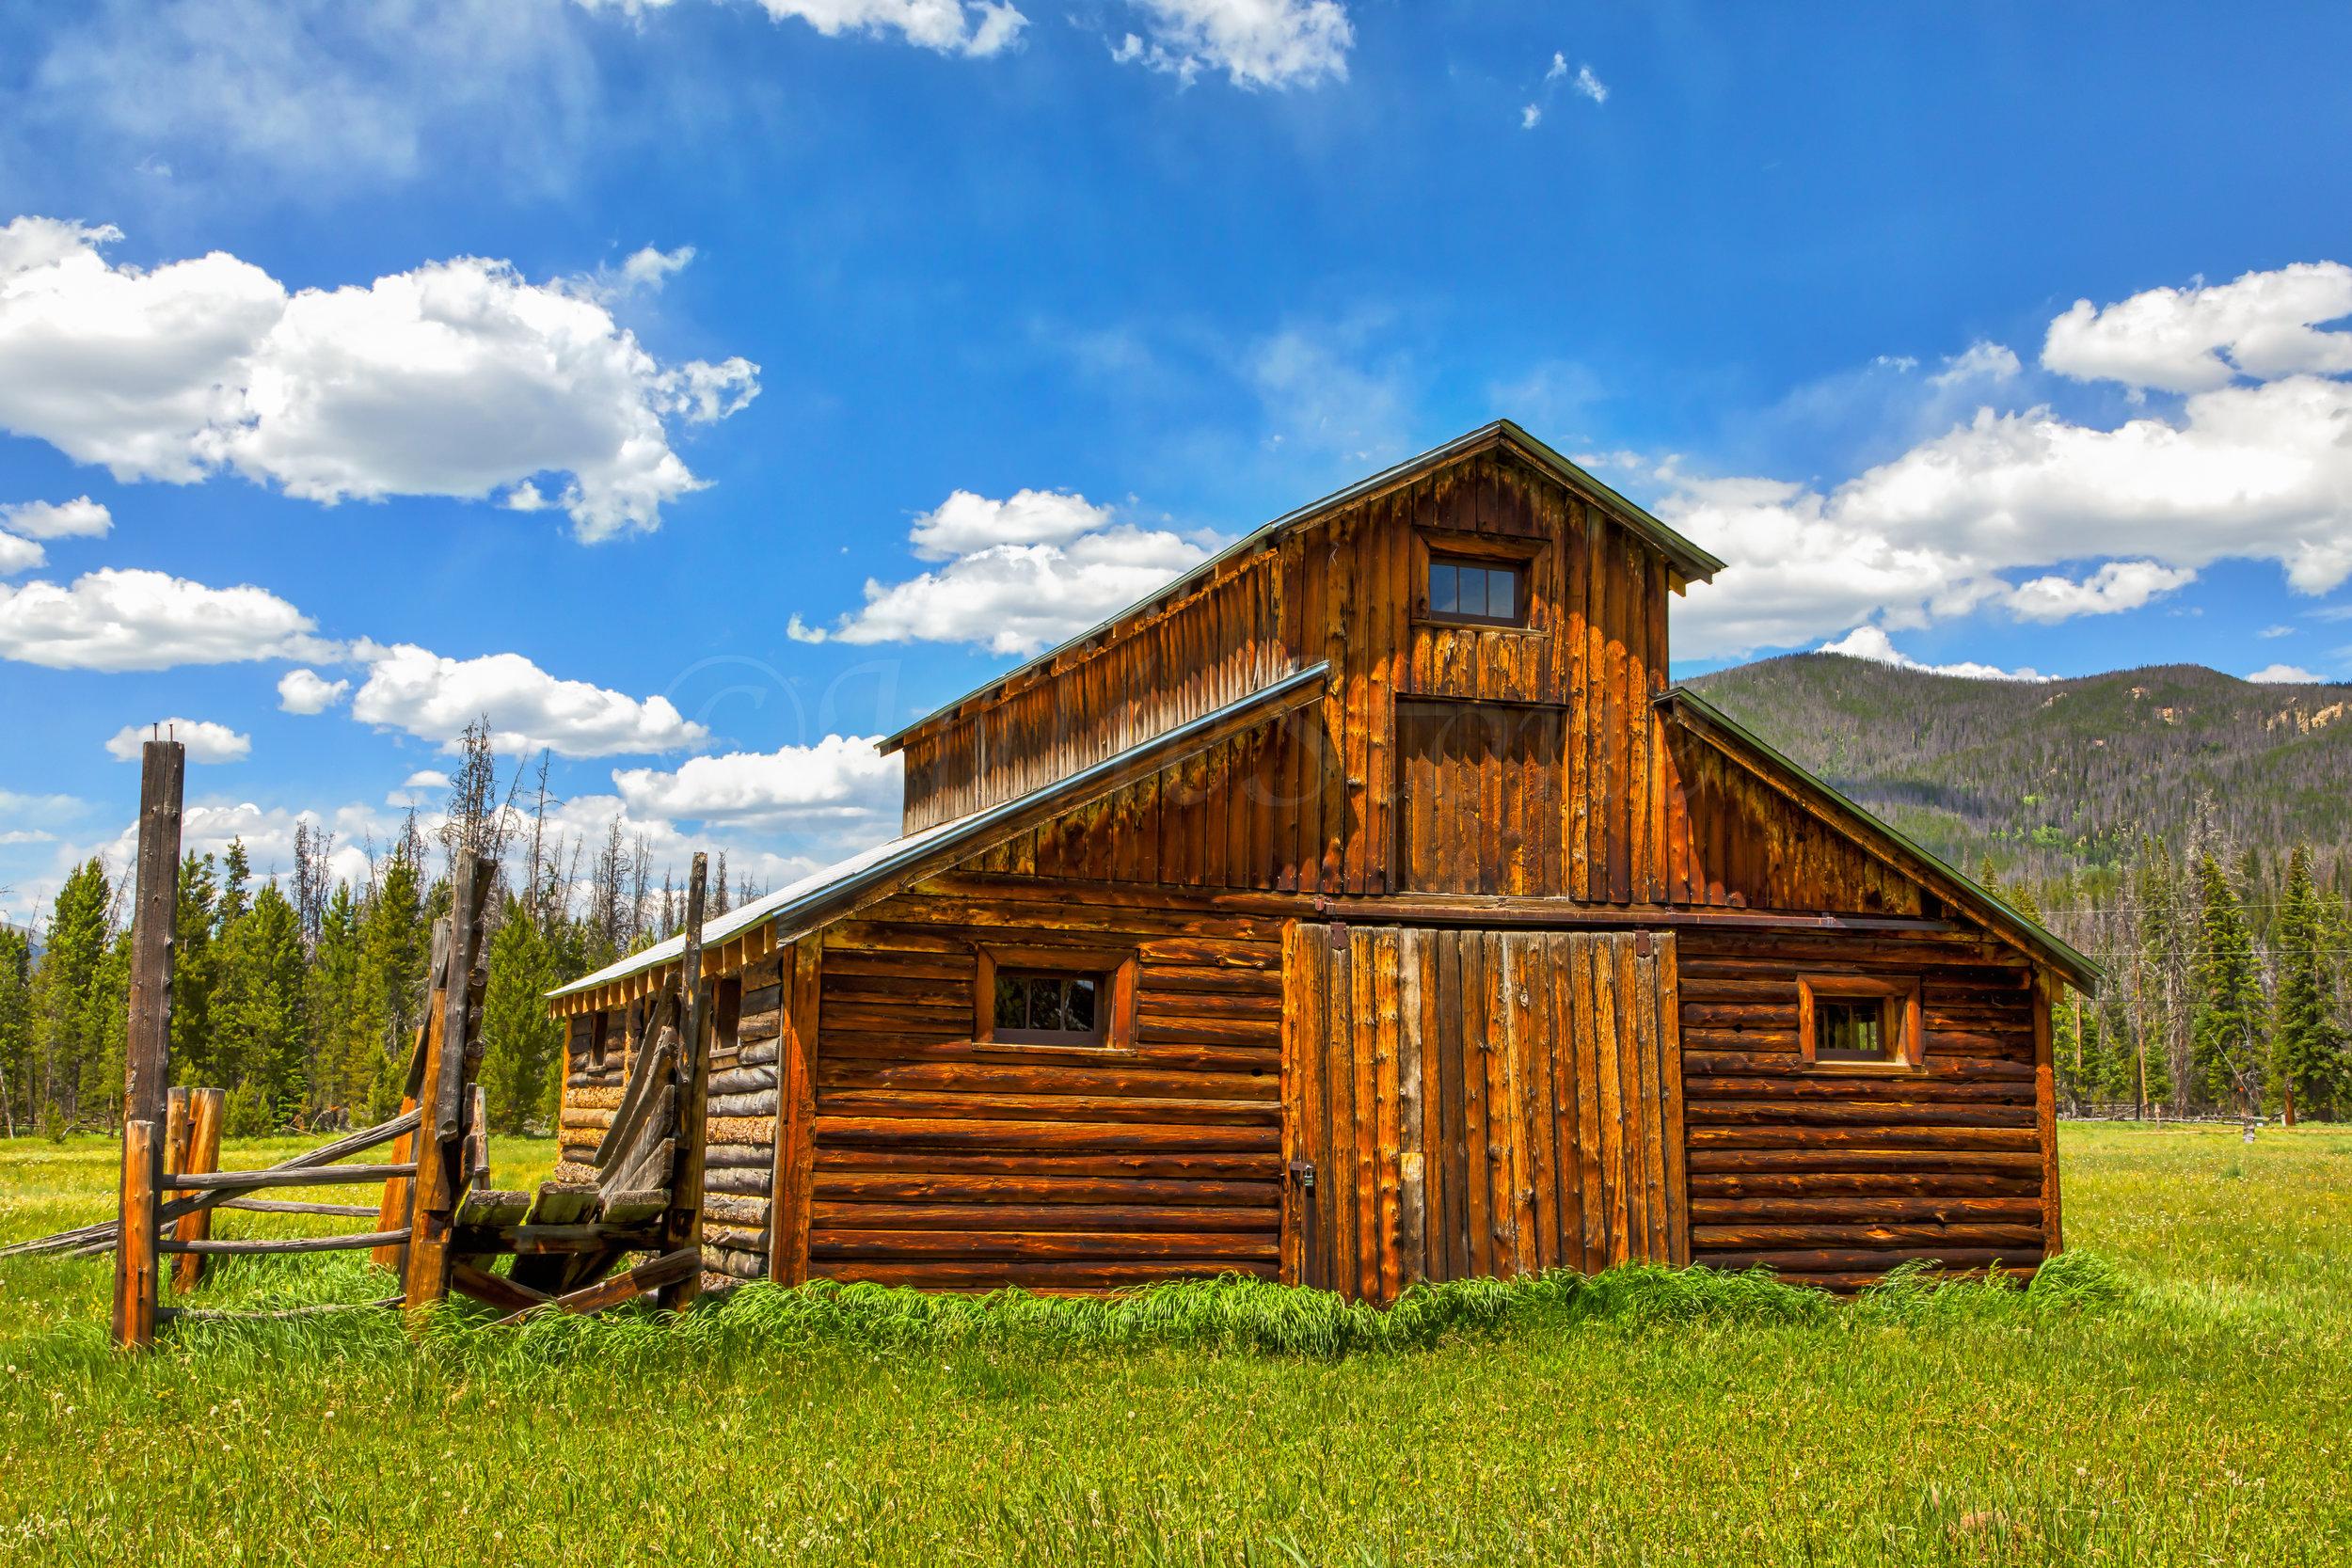 Little Buckaroo Barn, Image # 0668